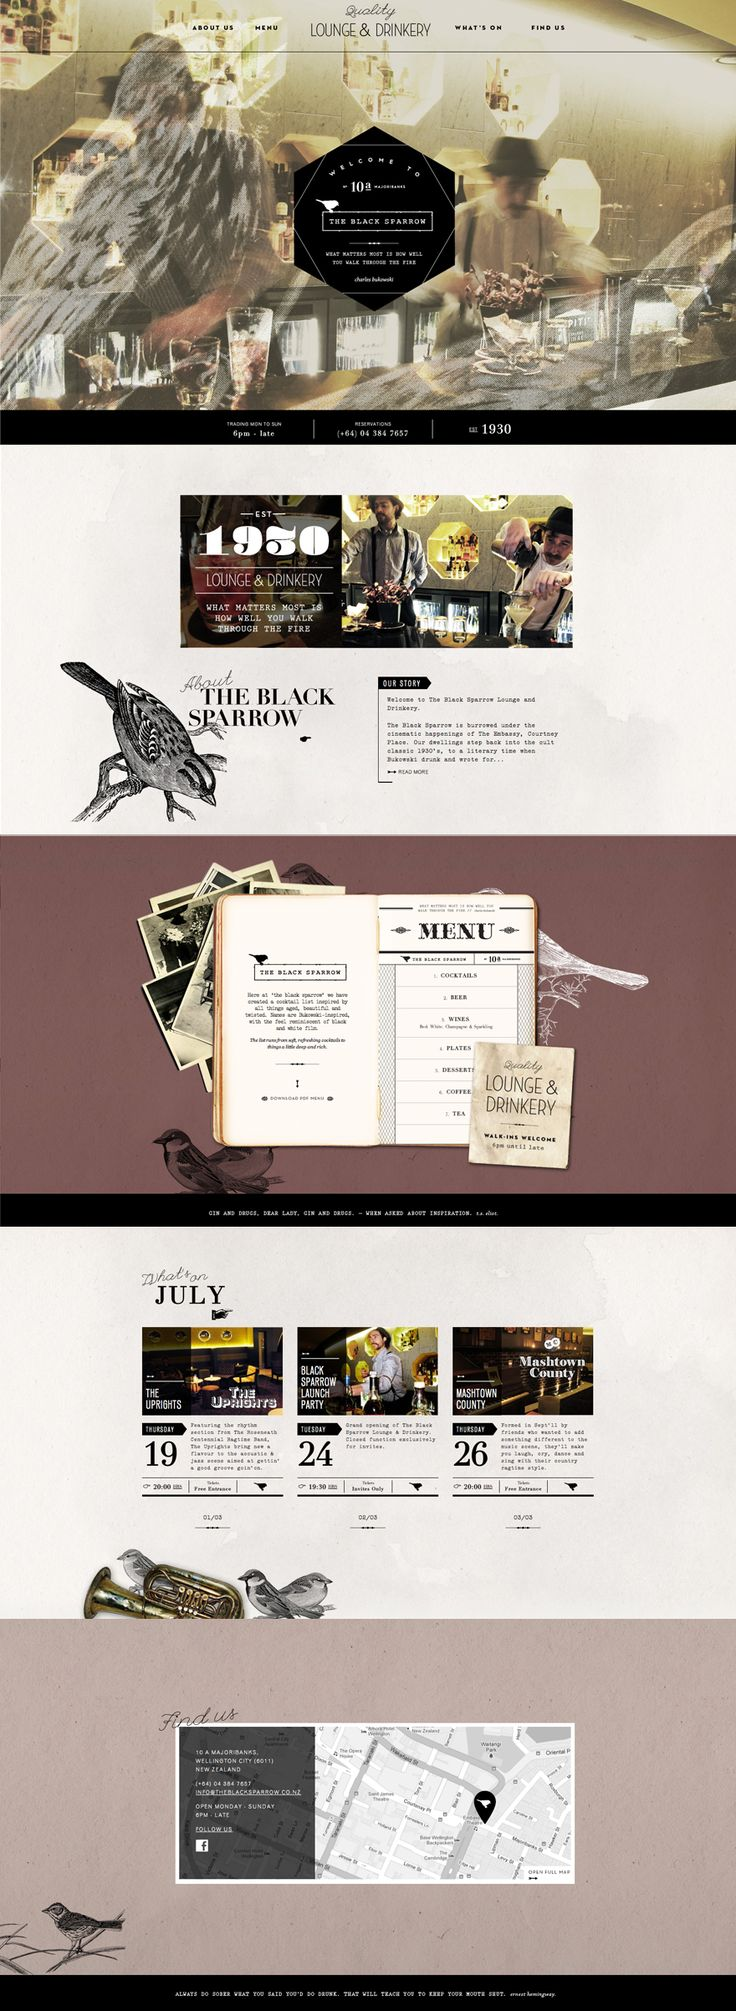 Unique Web Design, The Black Sparrow @clashingspirals #WebDesign #Design (http://www.pinterest.com/aldenchong/)